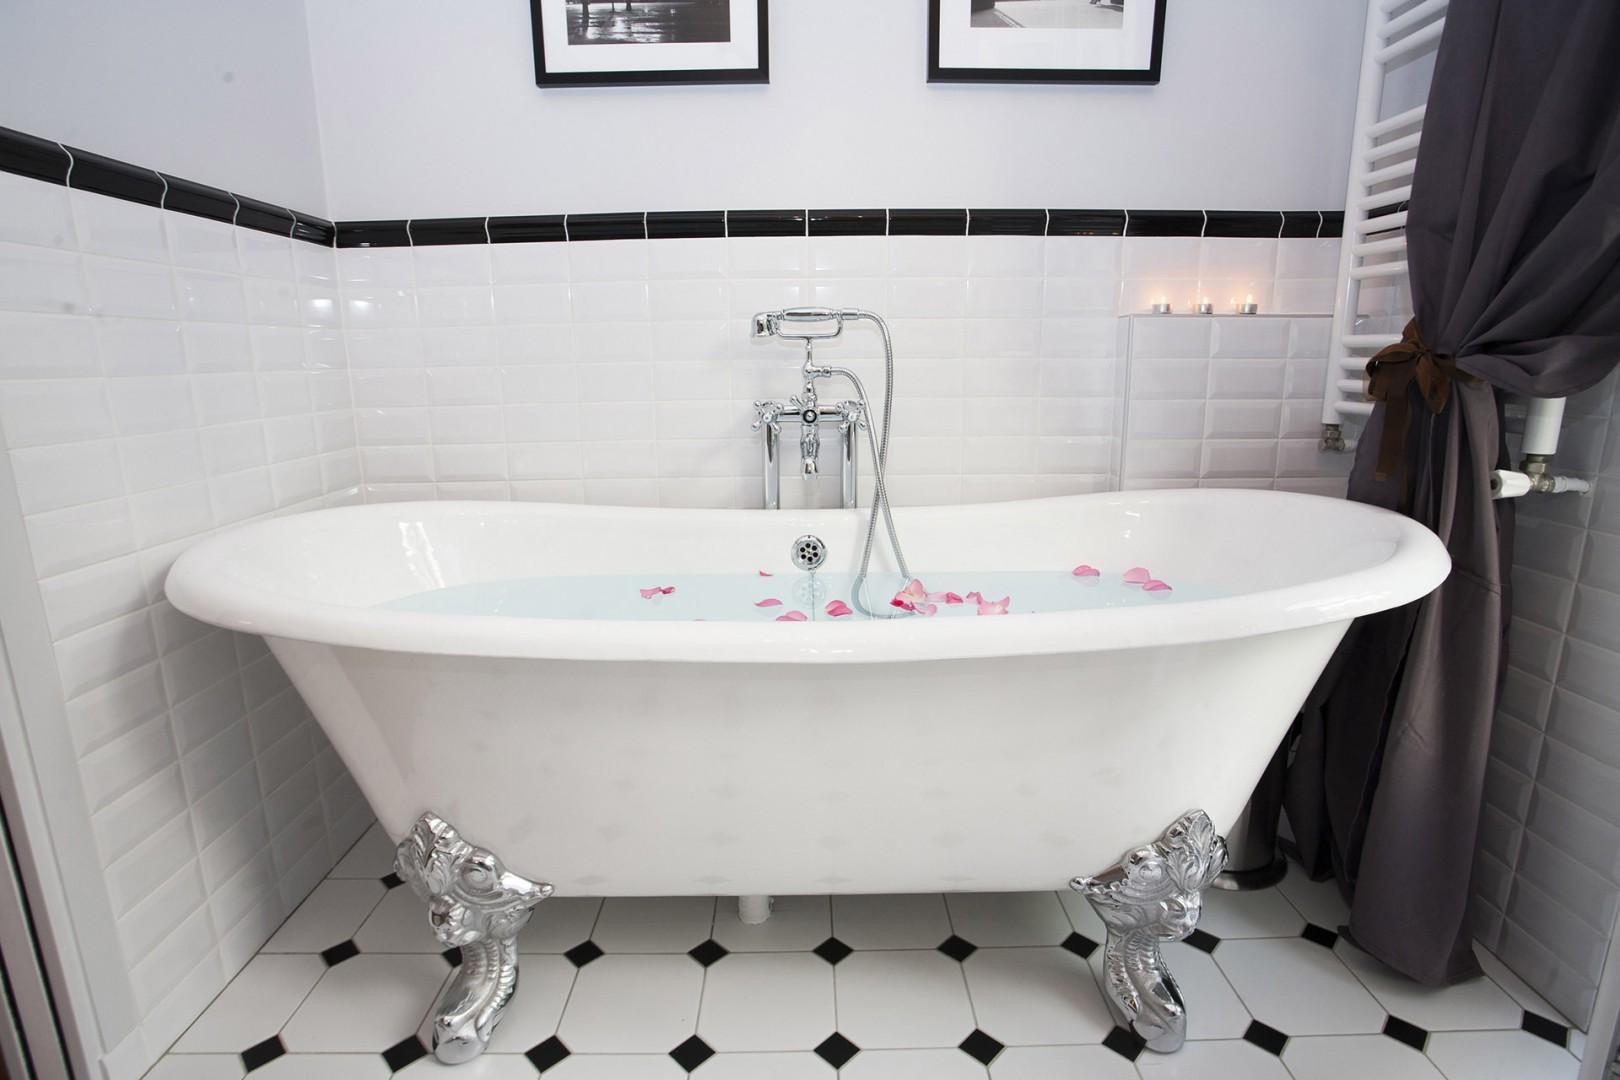 Beautiful claw-footed bathtub in the en suite bathroom